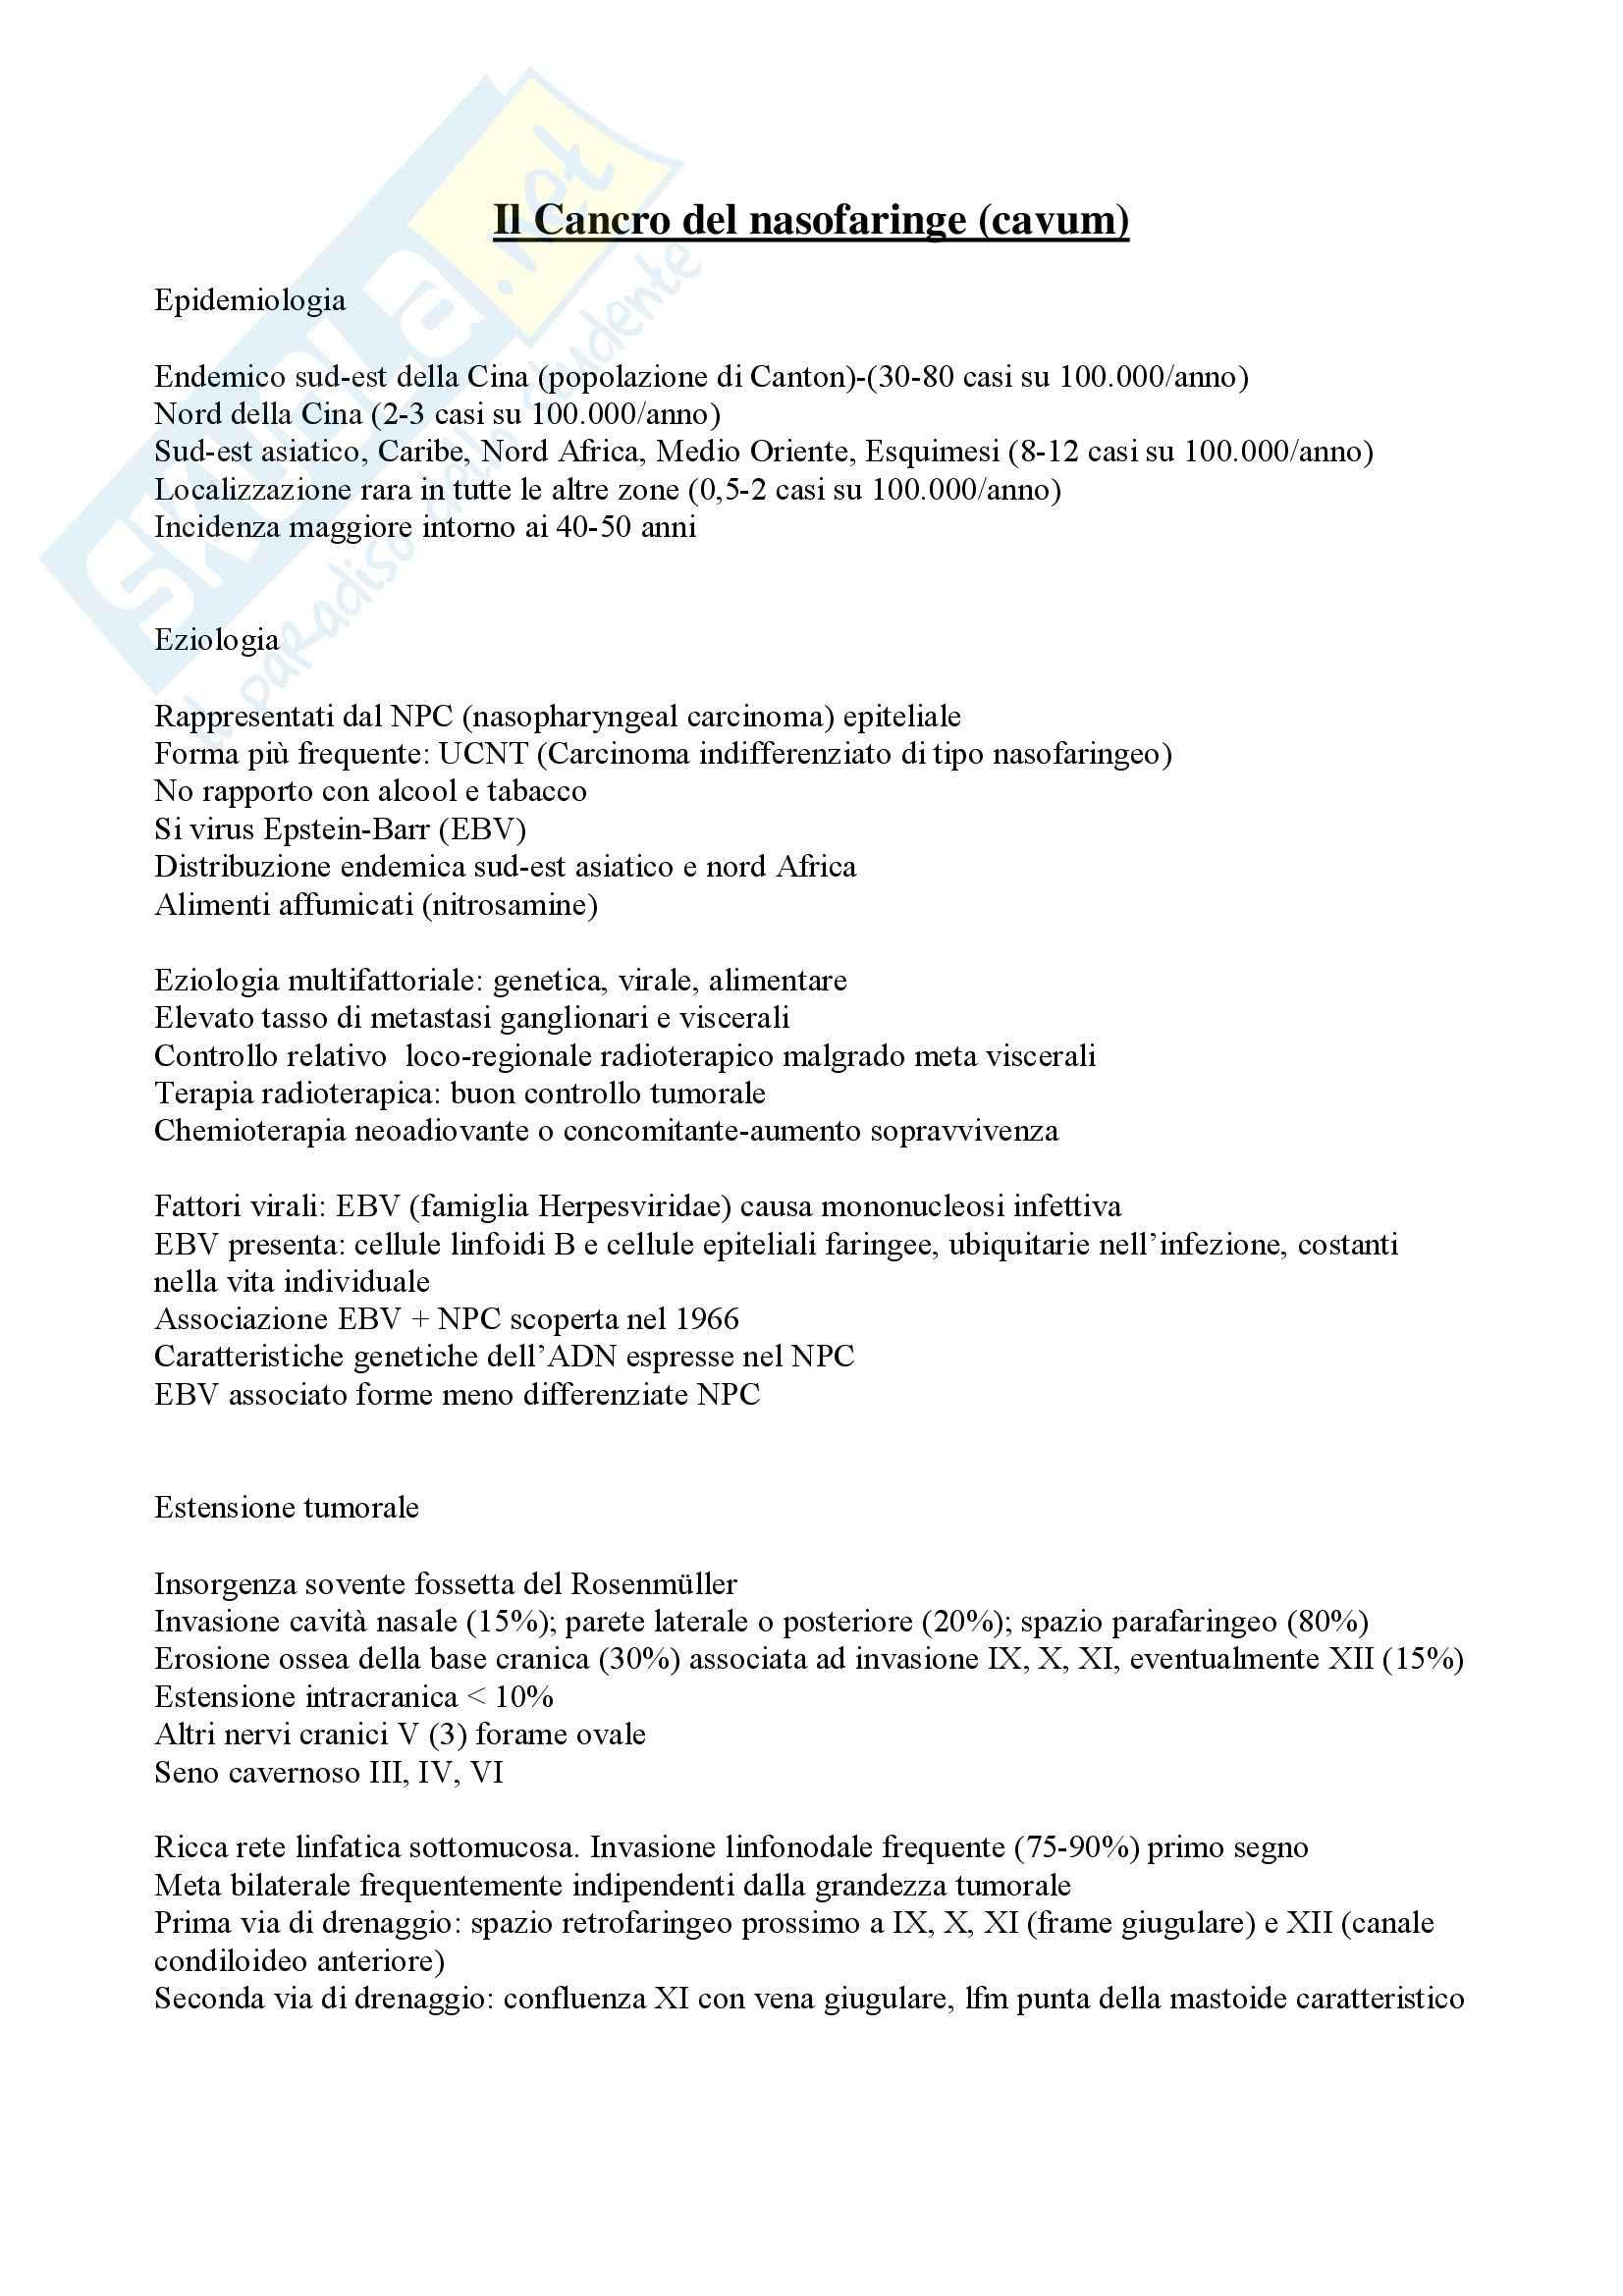 Rinofaringe - Cancro